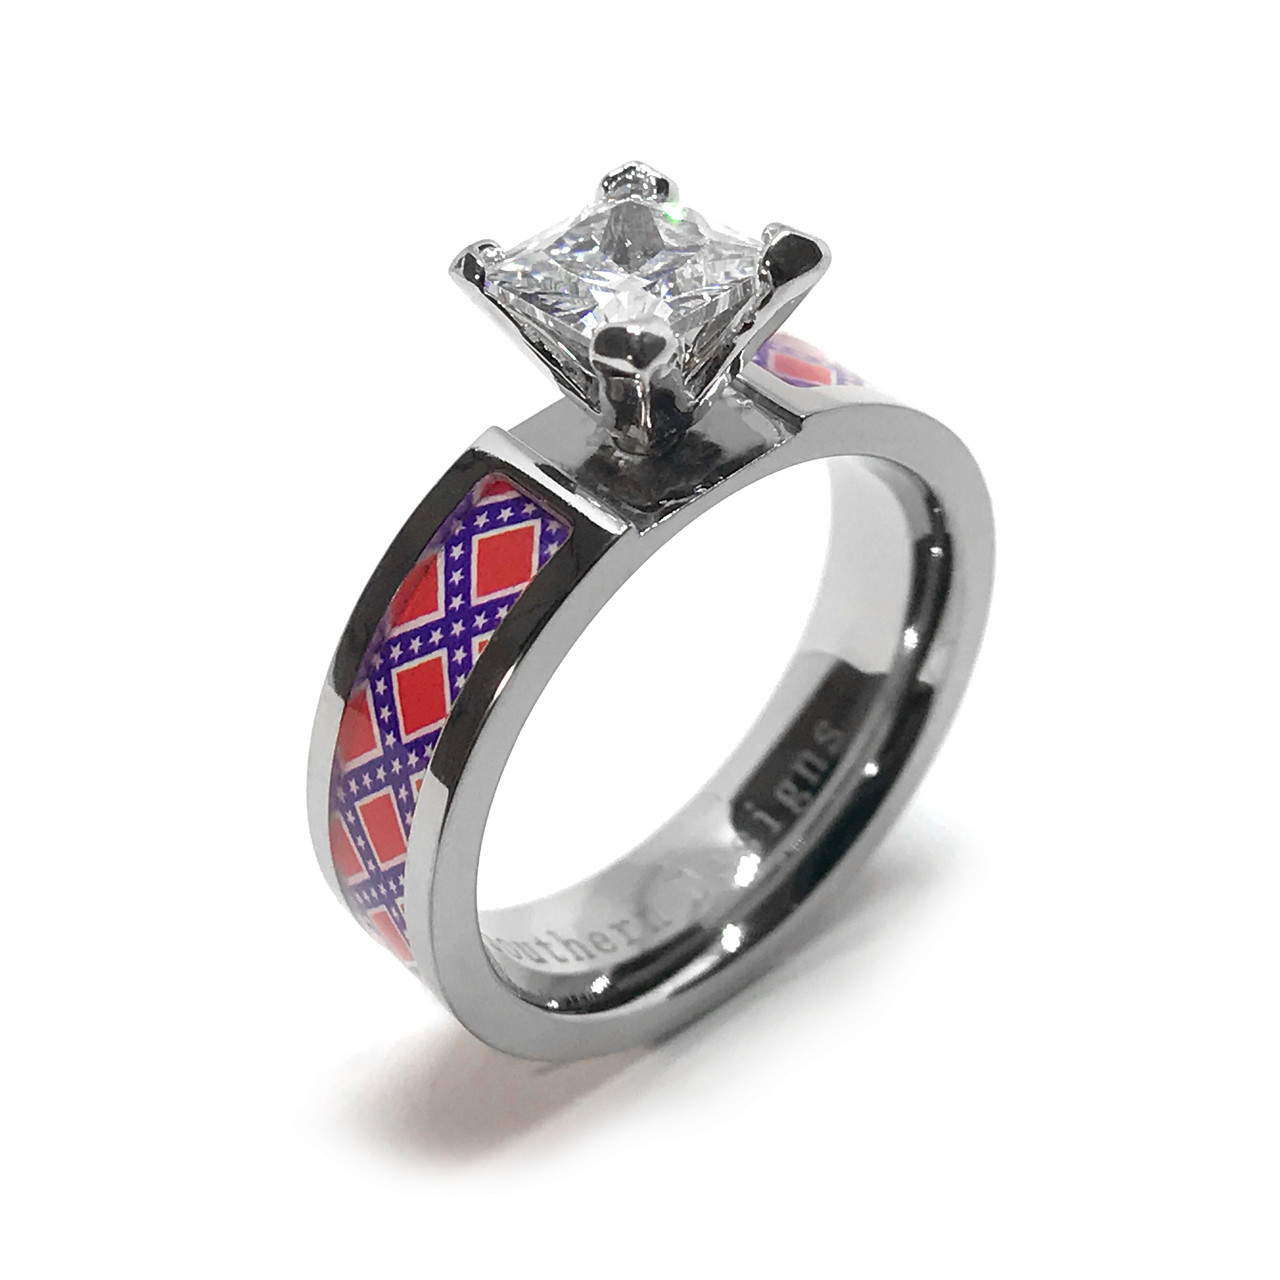 Rebel flag wedding ring on sale for Rebel designs jewelry sale